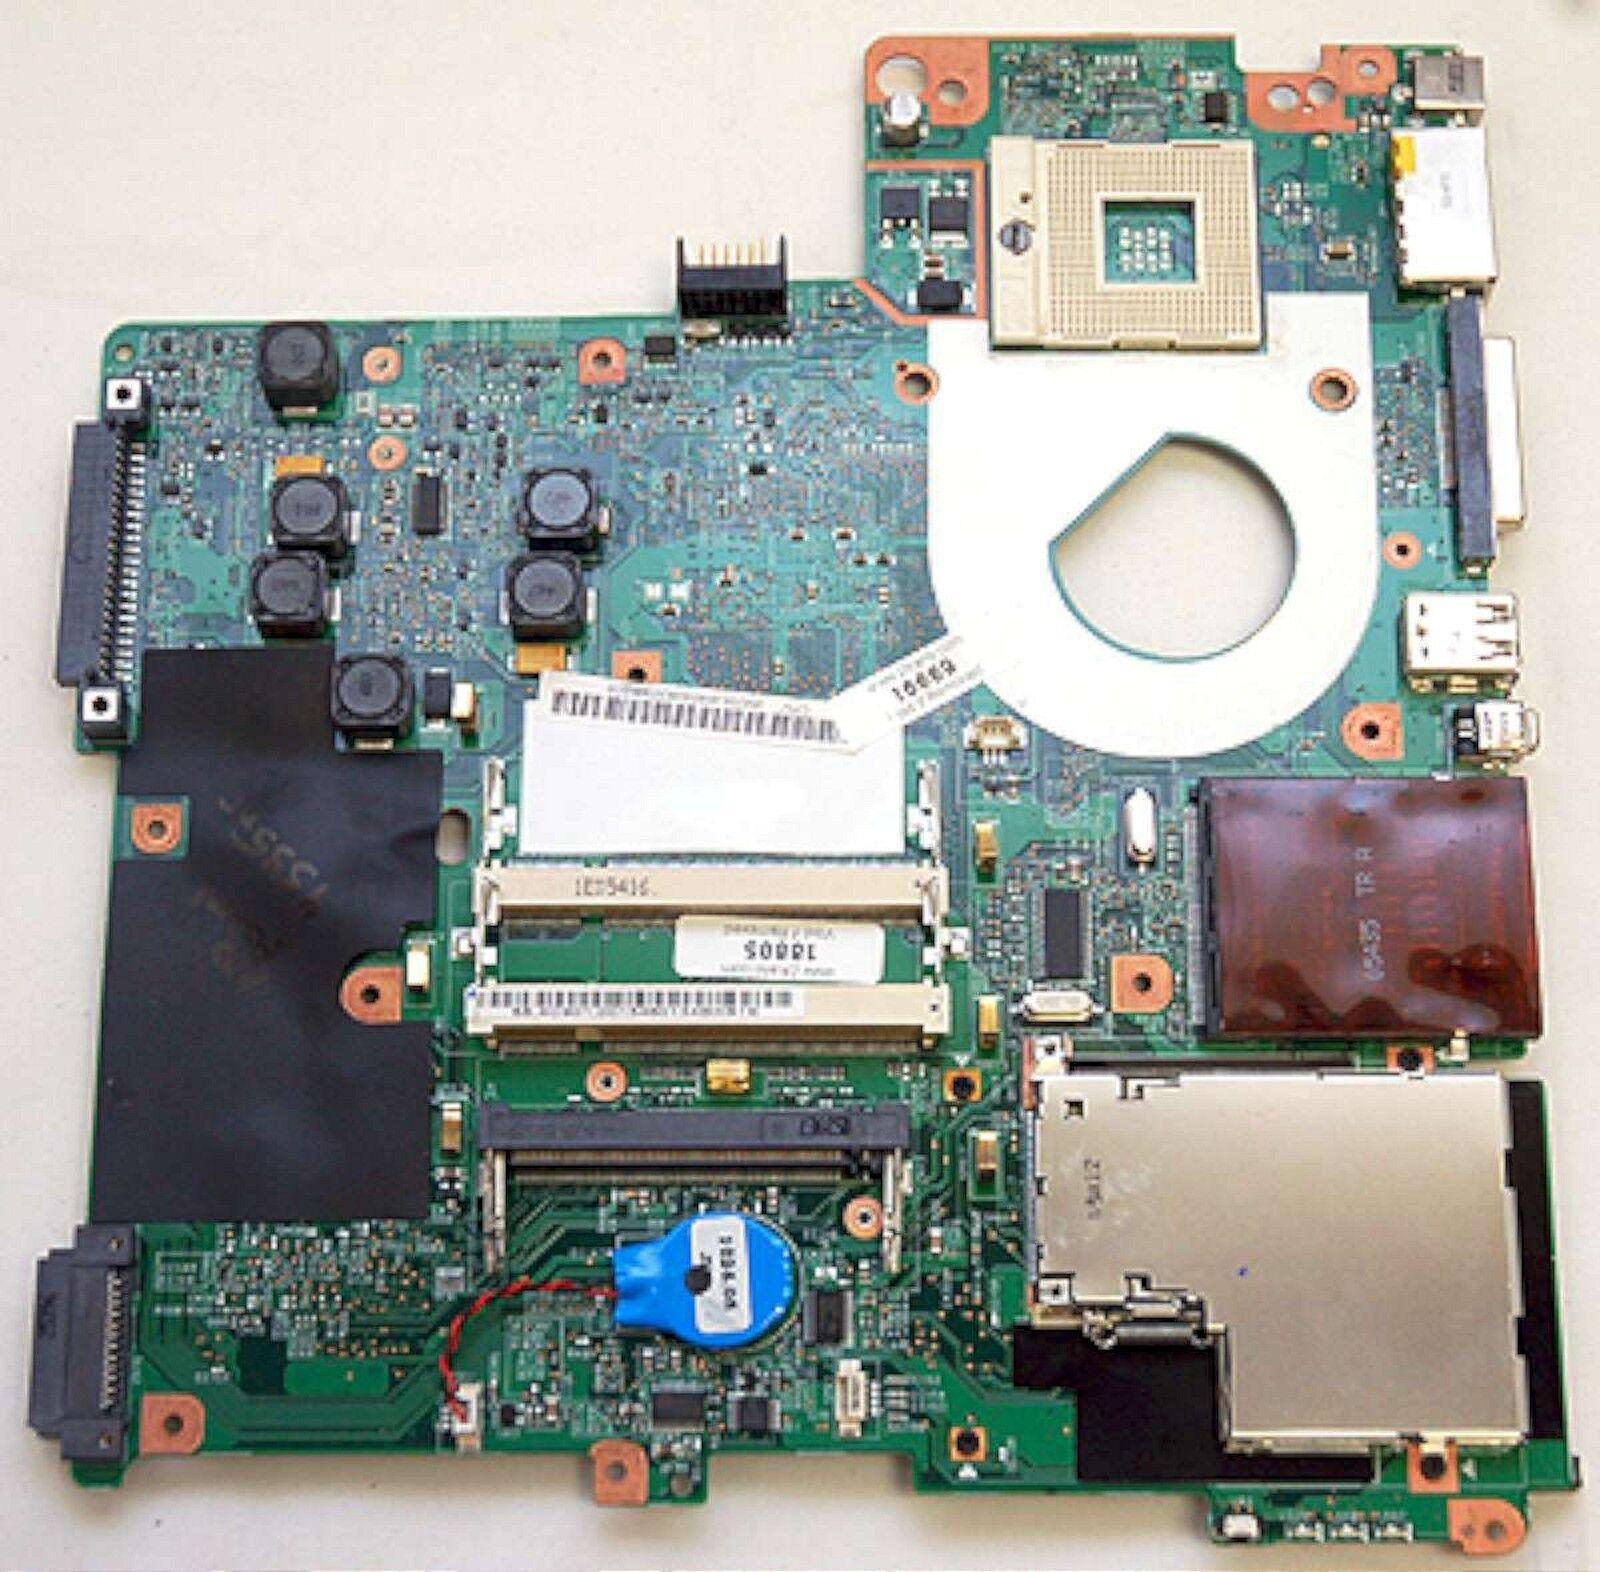 Compaq Presario Motherboard Sr1230 Wiring Diagram - Basic Wiring ...